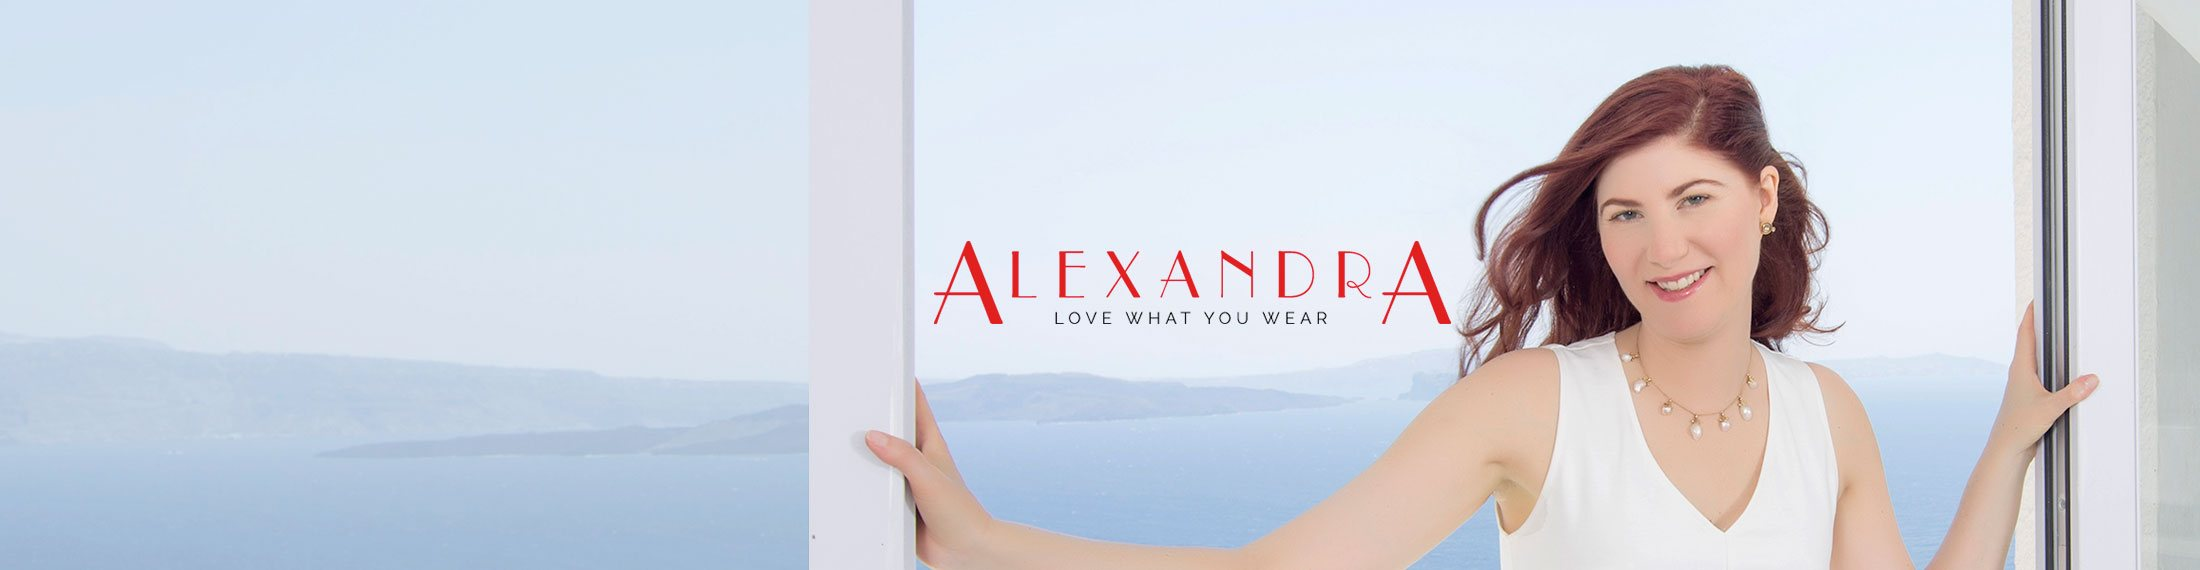 alexandra stylist banner